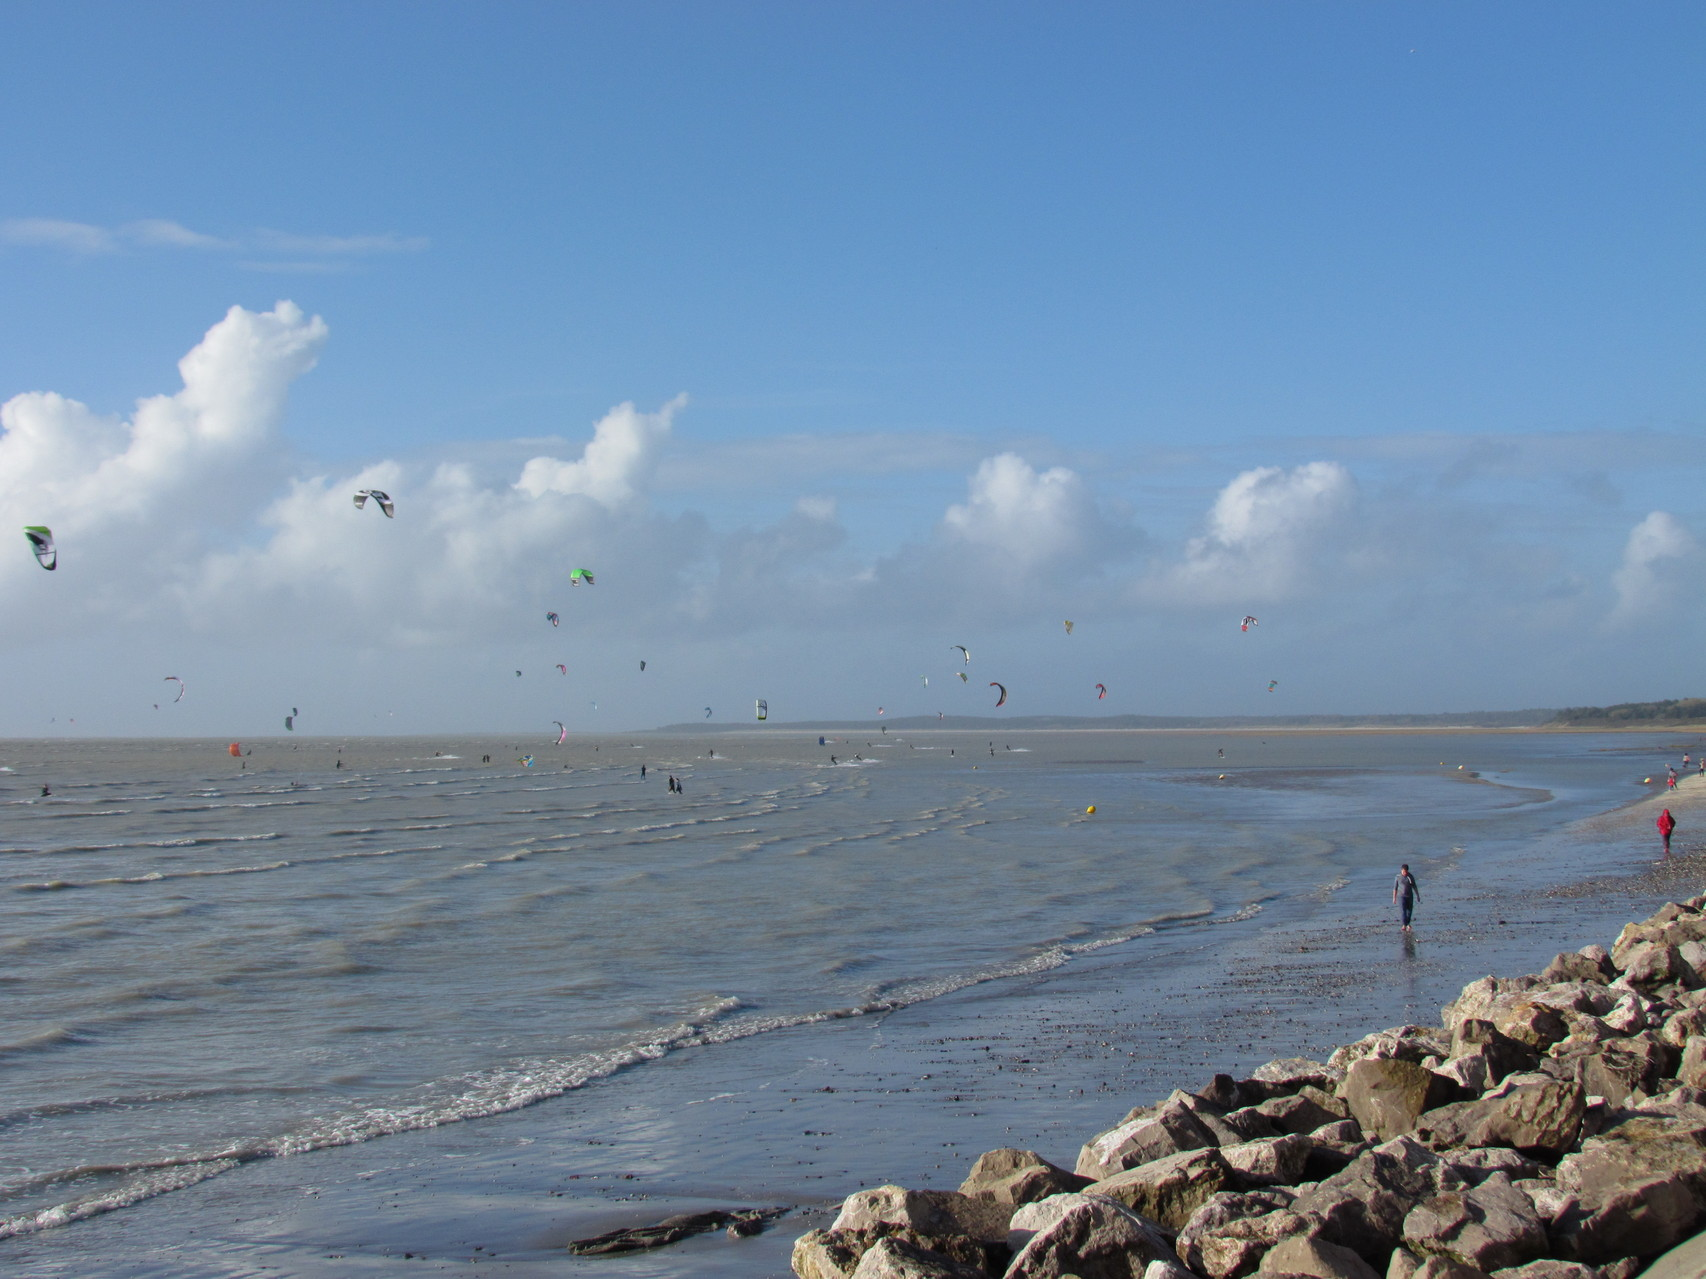 La plage du Crotoy et ses kitesurfs